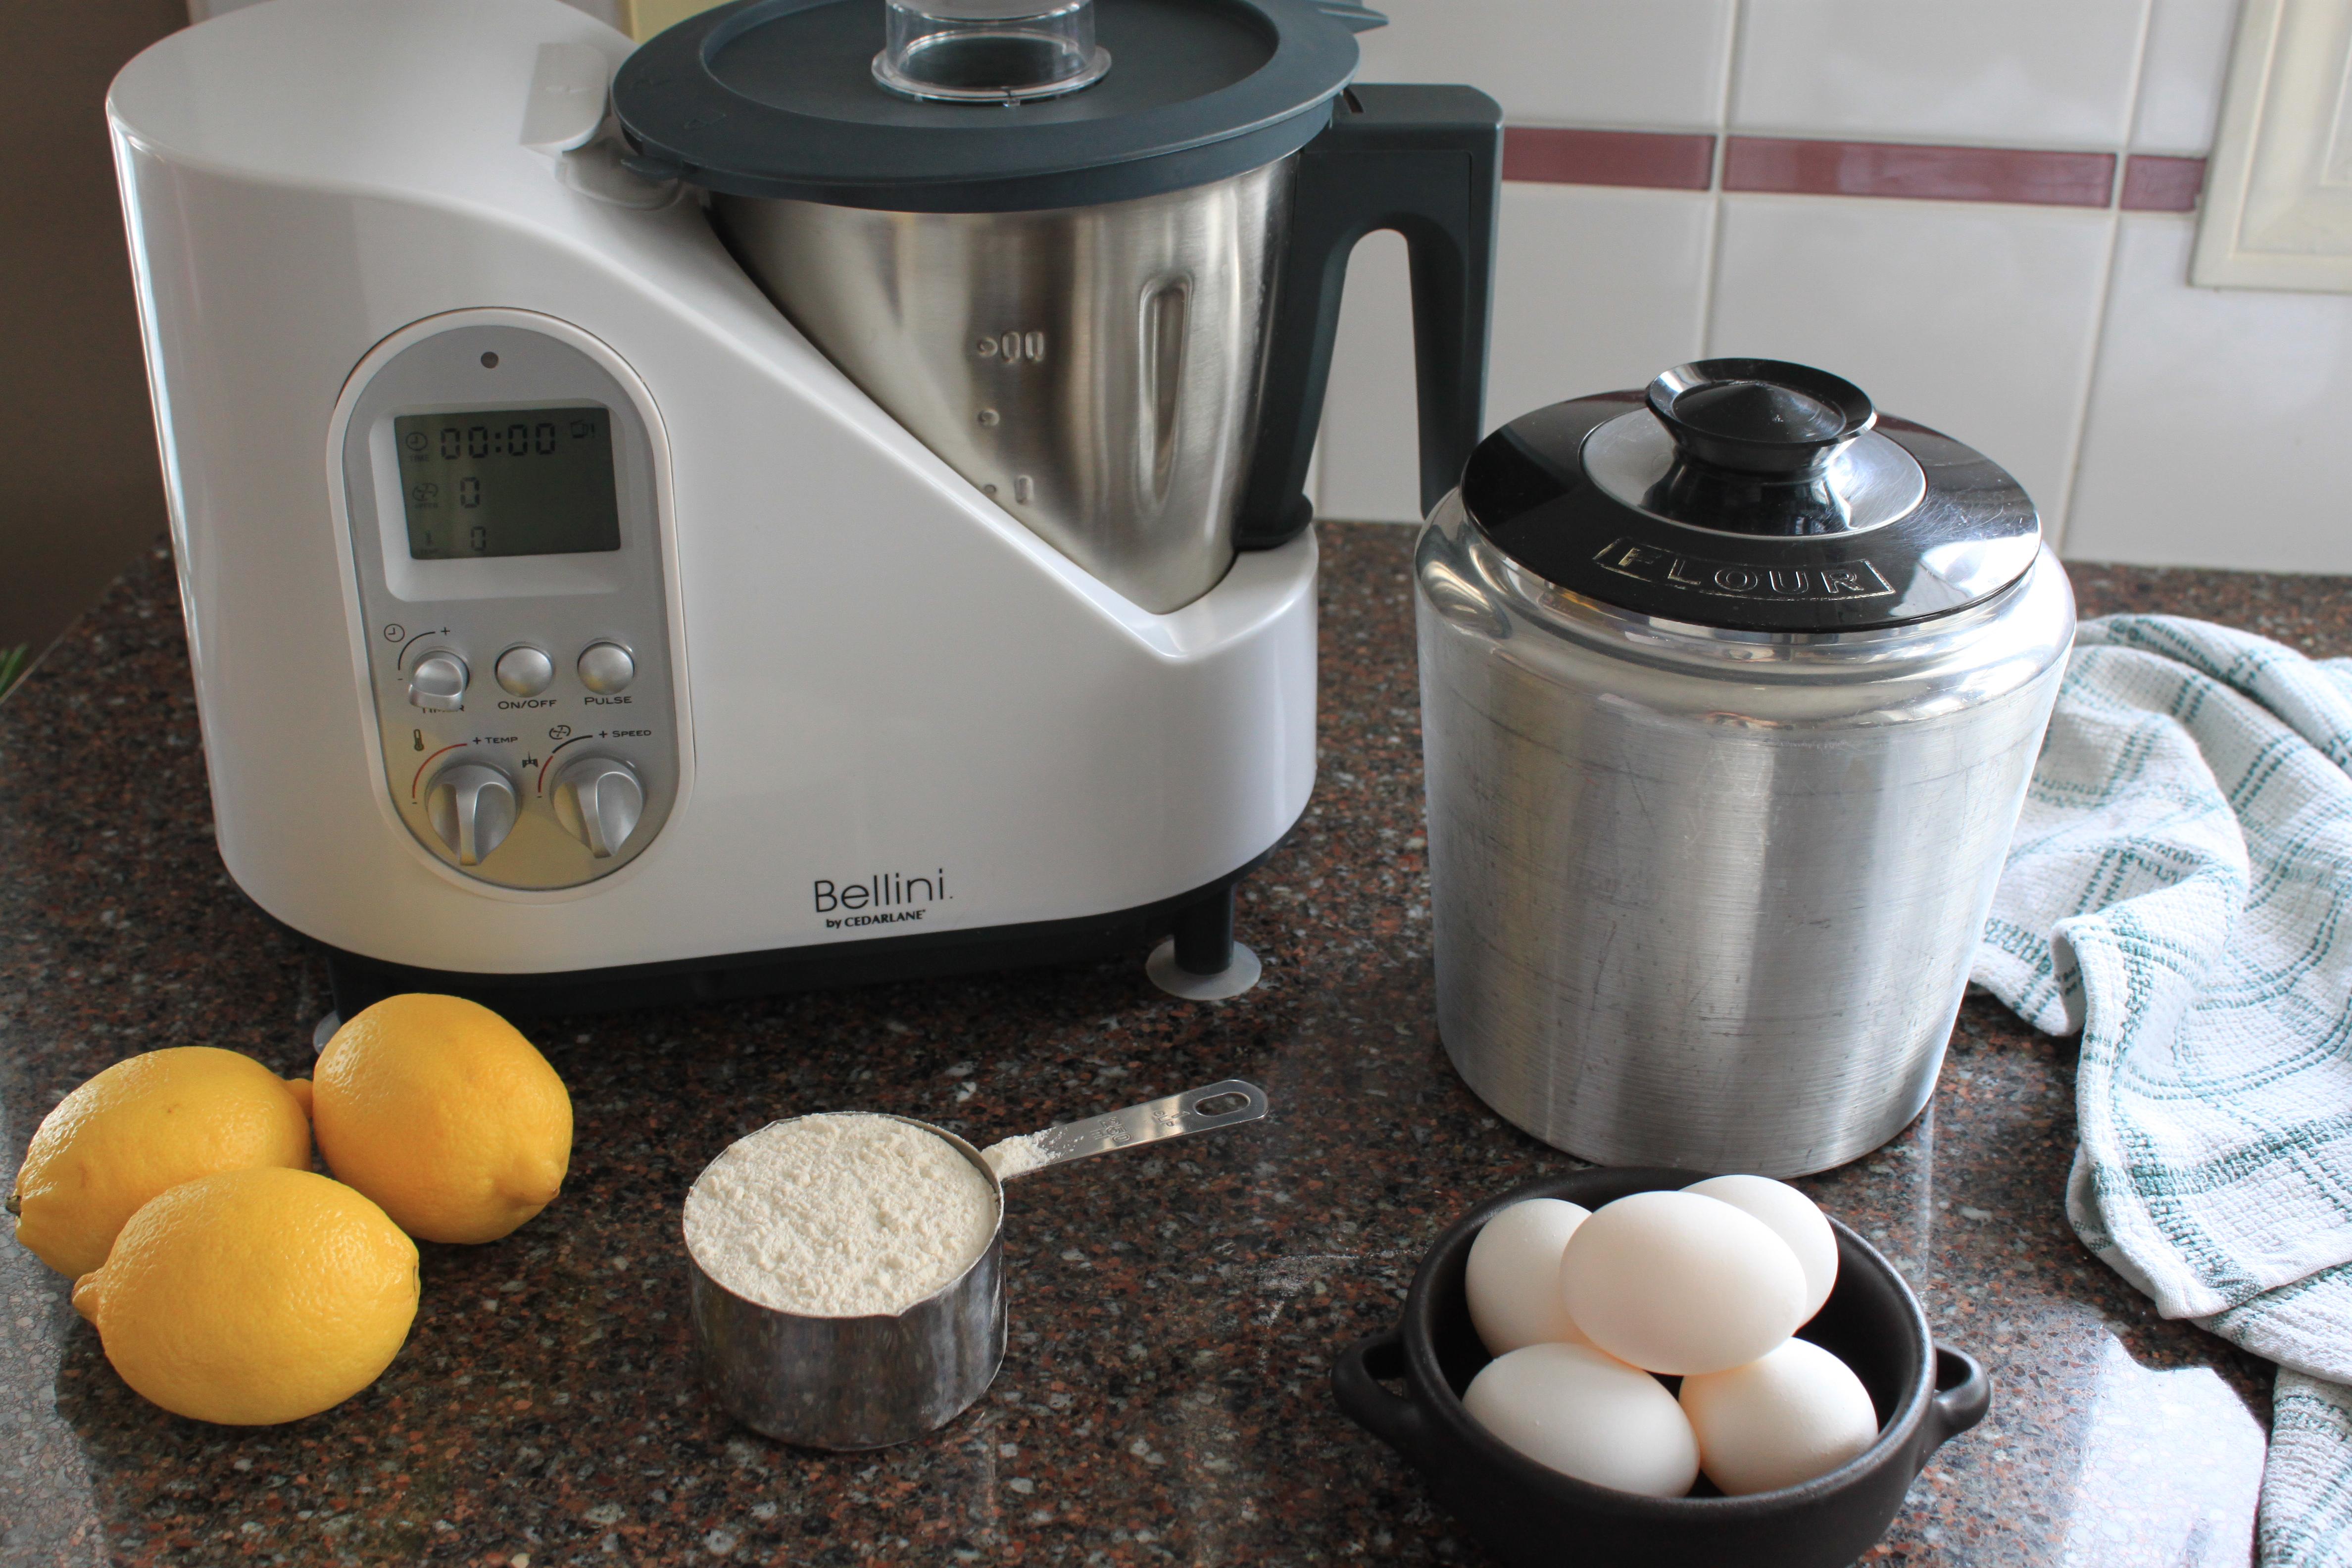 Uncategorized Bellini Kitchen Appliances bellini kitchen master lemon meringue pie dish n the 062